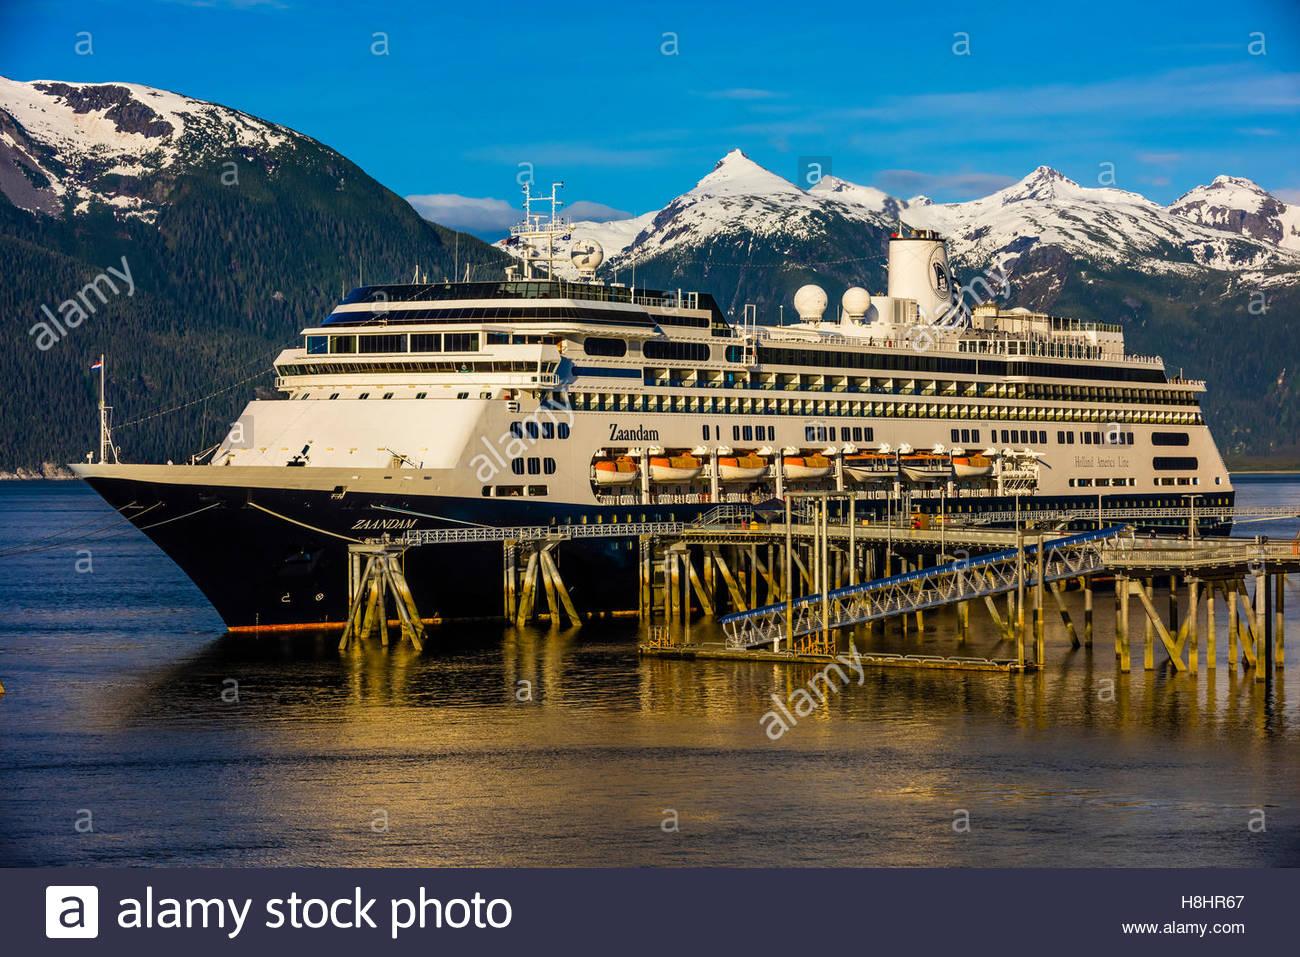 Holland America Lines MS Zaandam Cruise Ship Docked In Haines - Zaandam ship